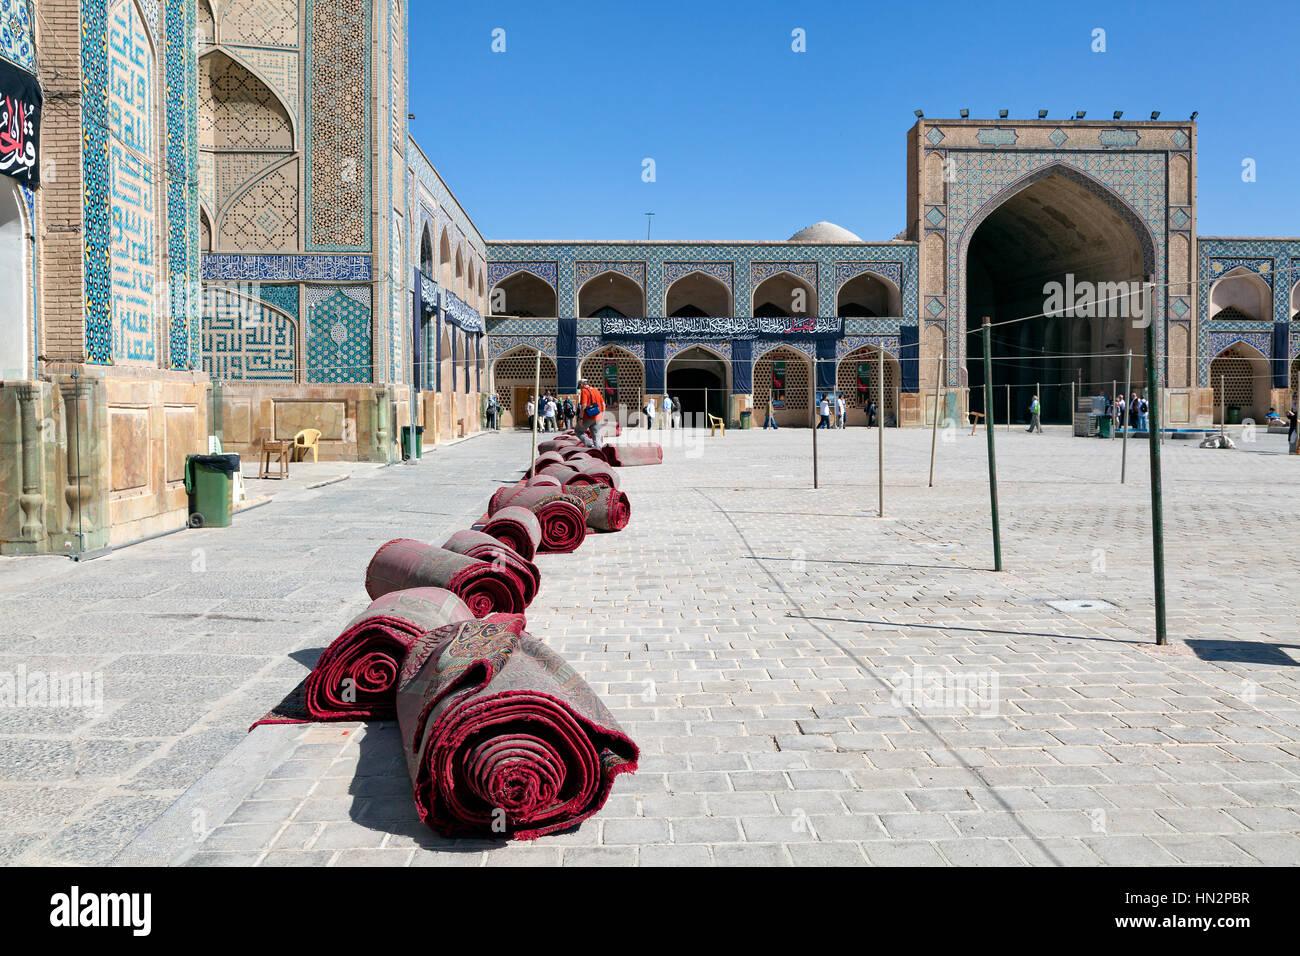 Courtyard Of Jameh Mosque Photos Courtyard Of Jameh Mosque Images - Carrelage piscine et tapis ispahan